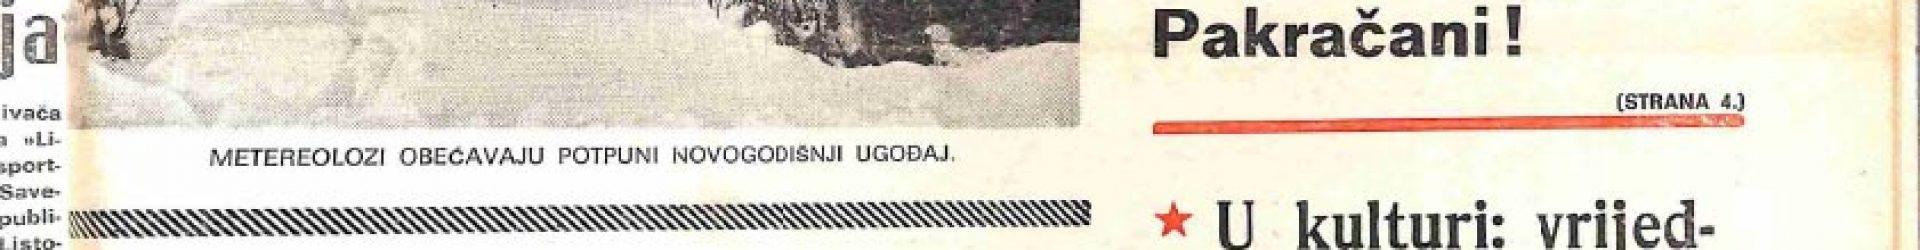 29 prosinca 1978